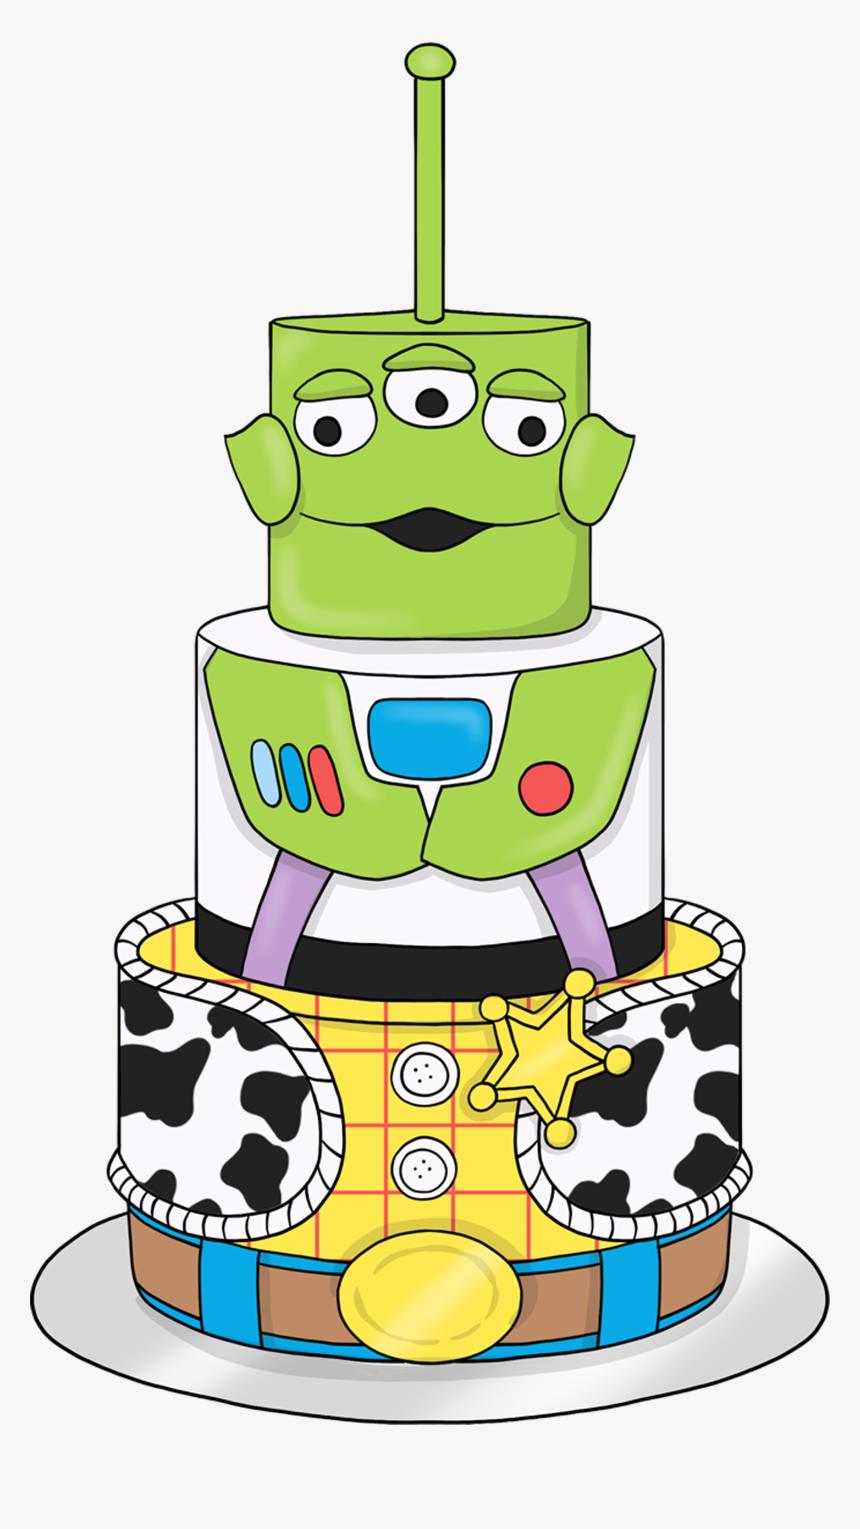 Miraculous Toystory Birthdaycake Alien Buzzlightyear Woody Cartoon Hd Funny Birthday Cards Online Alyptdamsfinfo